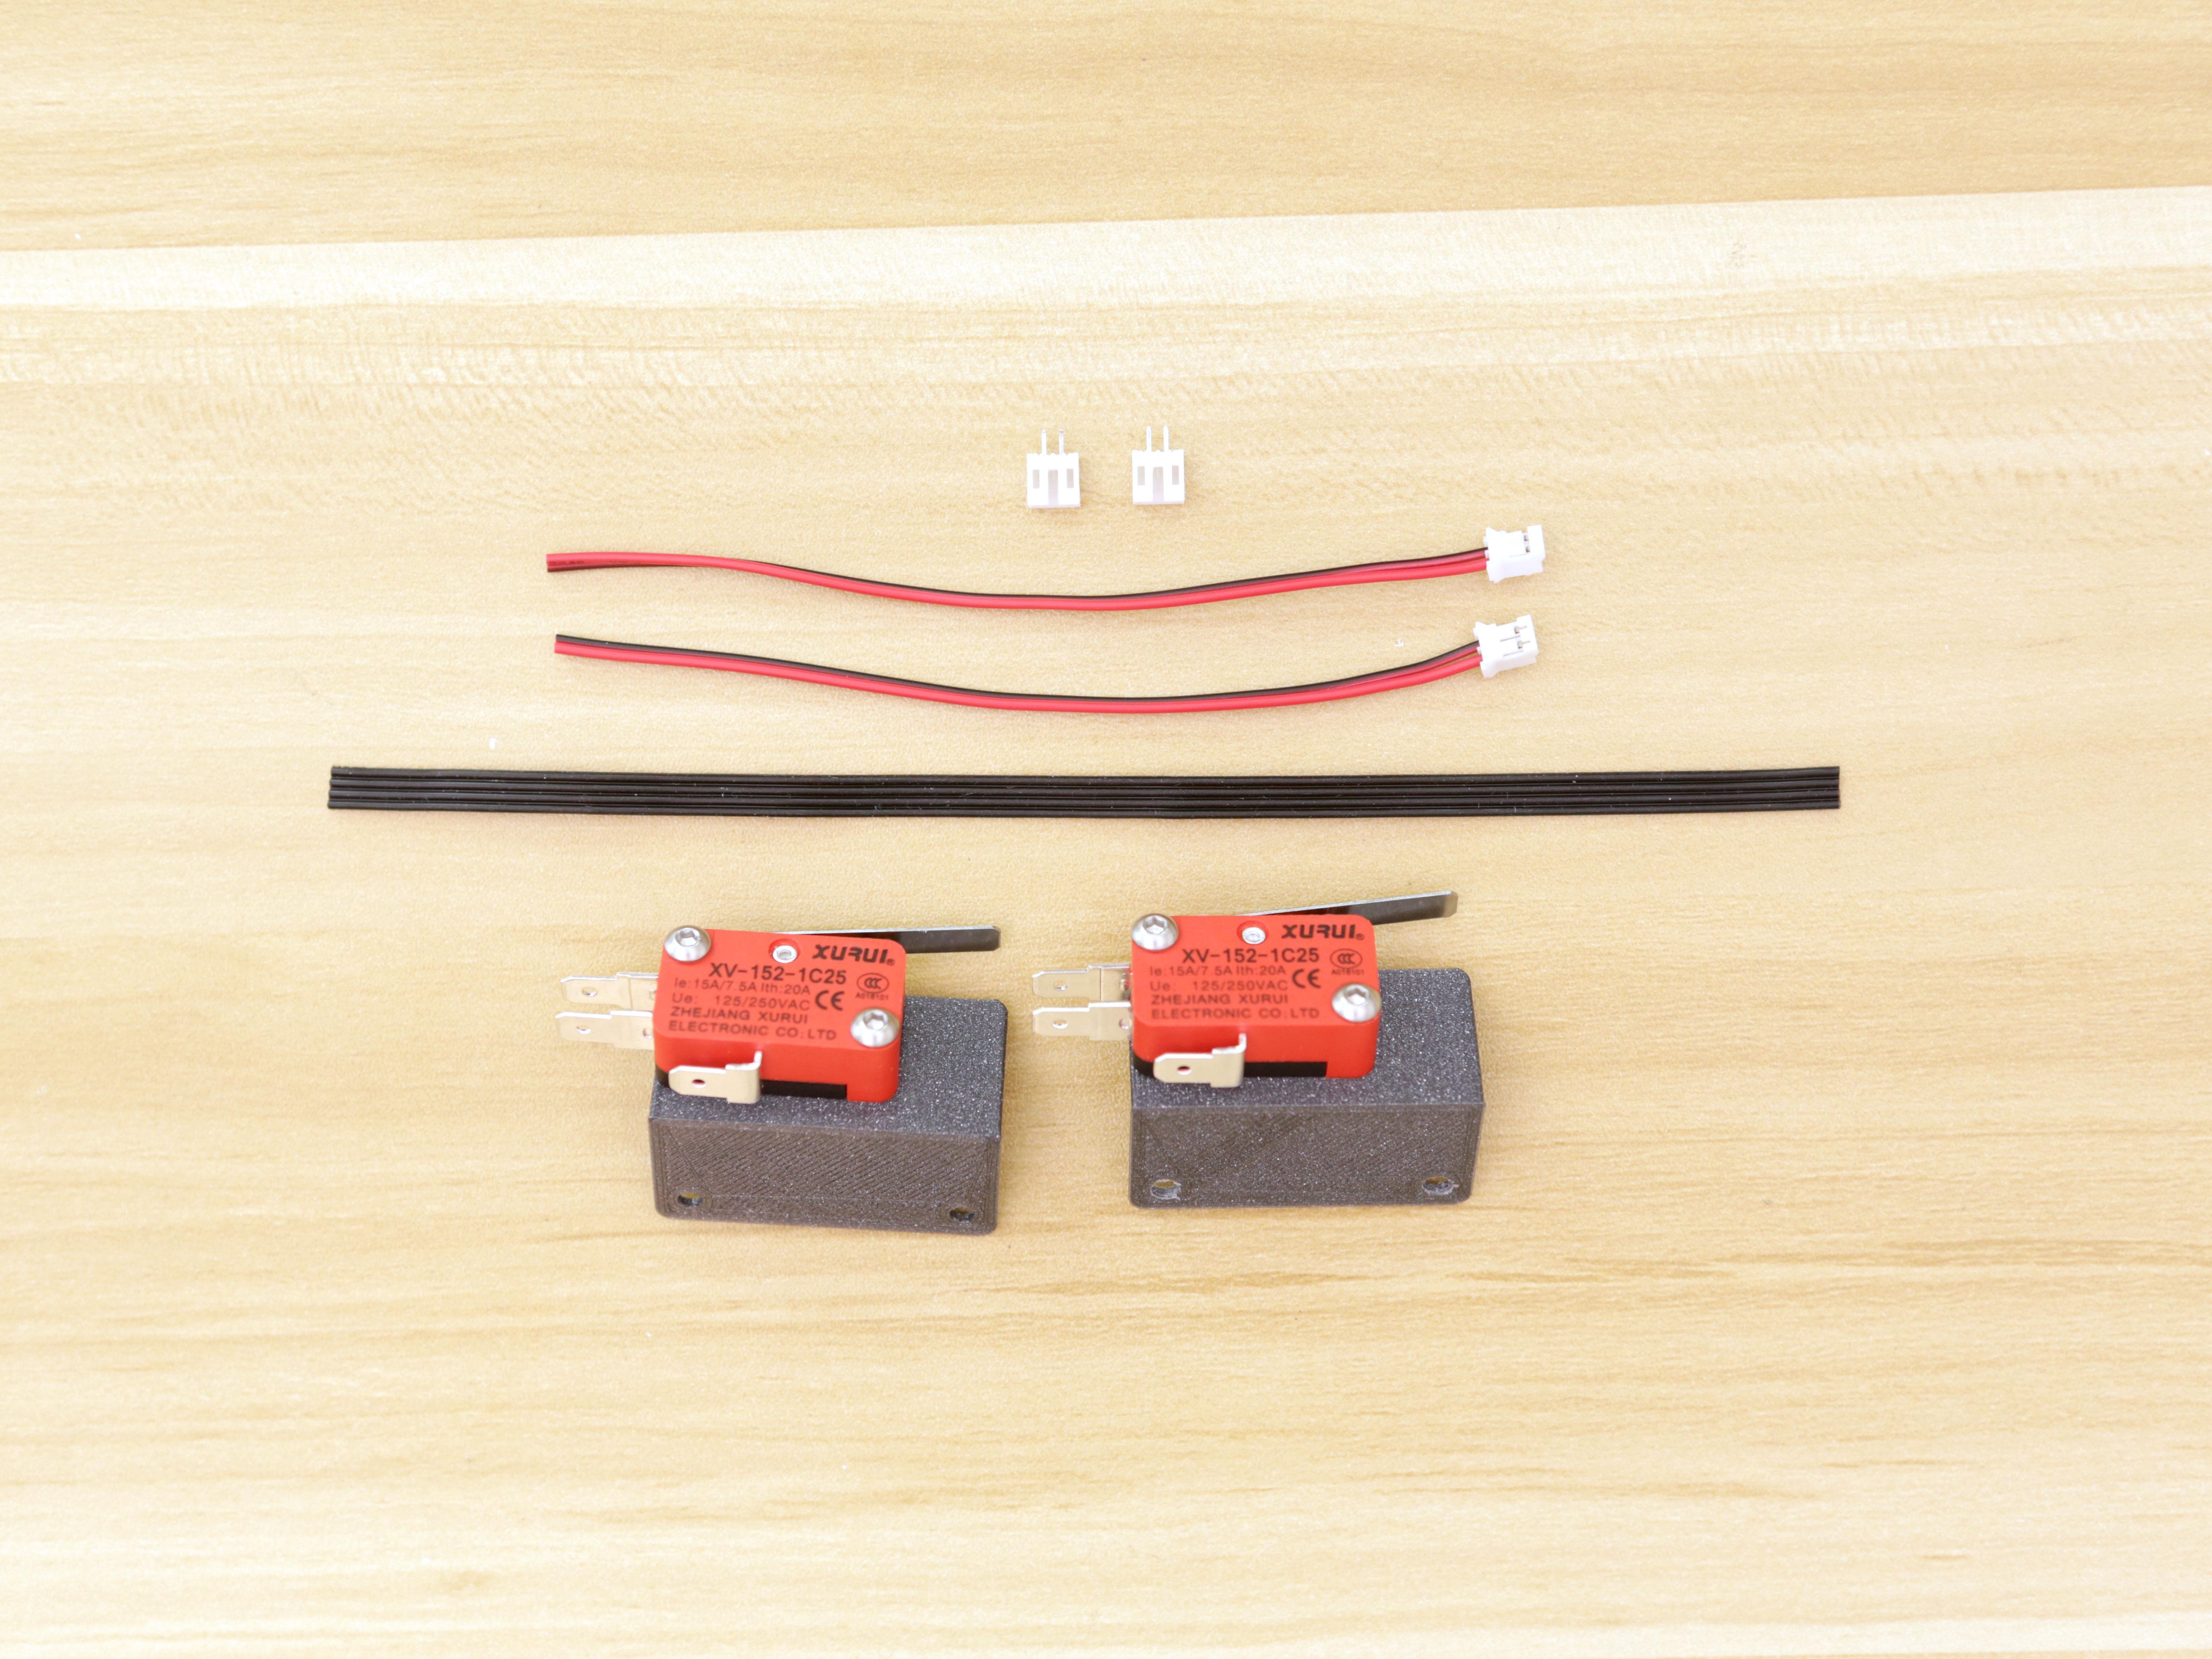 3d_printing_microsw-wires.jpg